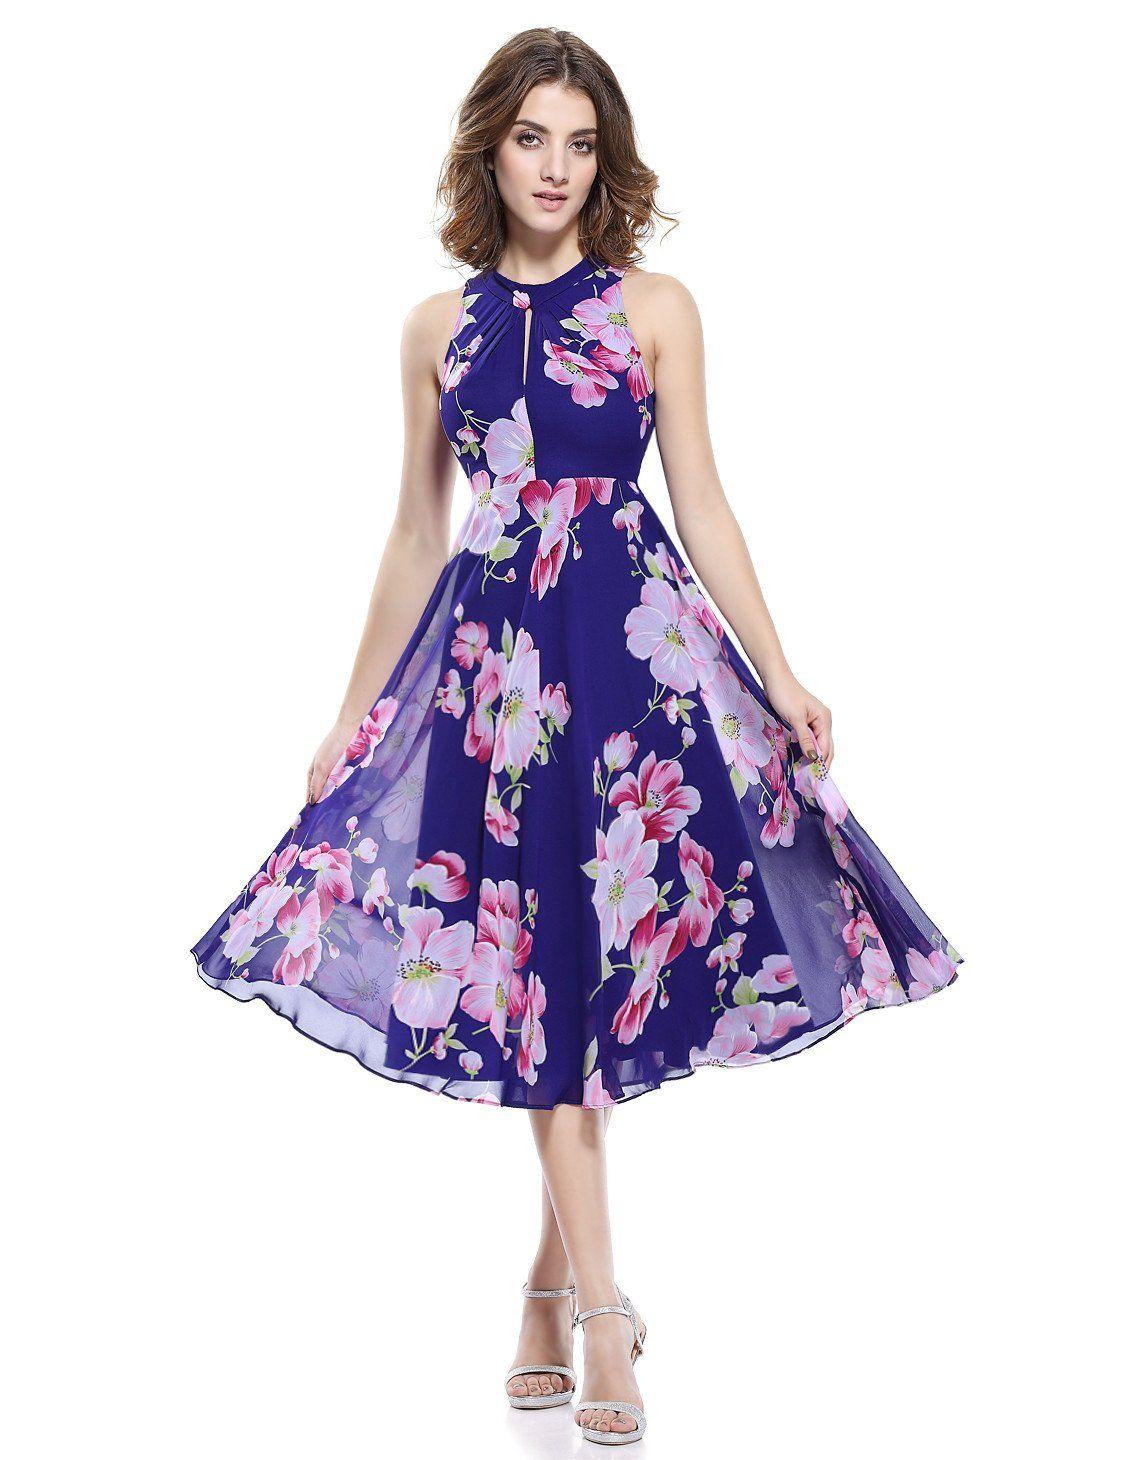 Vestido primaveral Klervi | Vestidos | Pinterest | Vestiditos ...